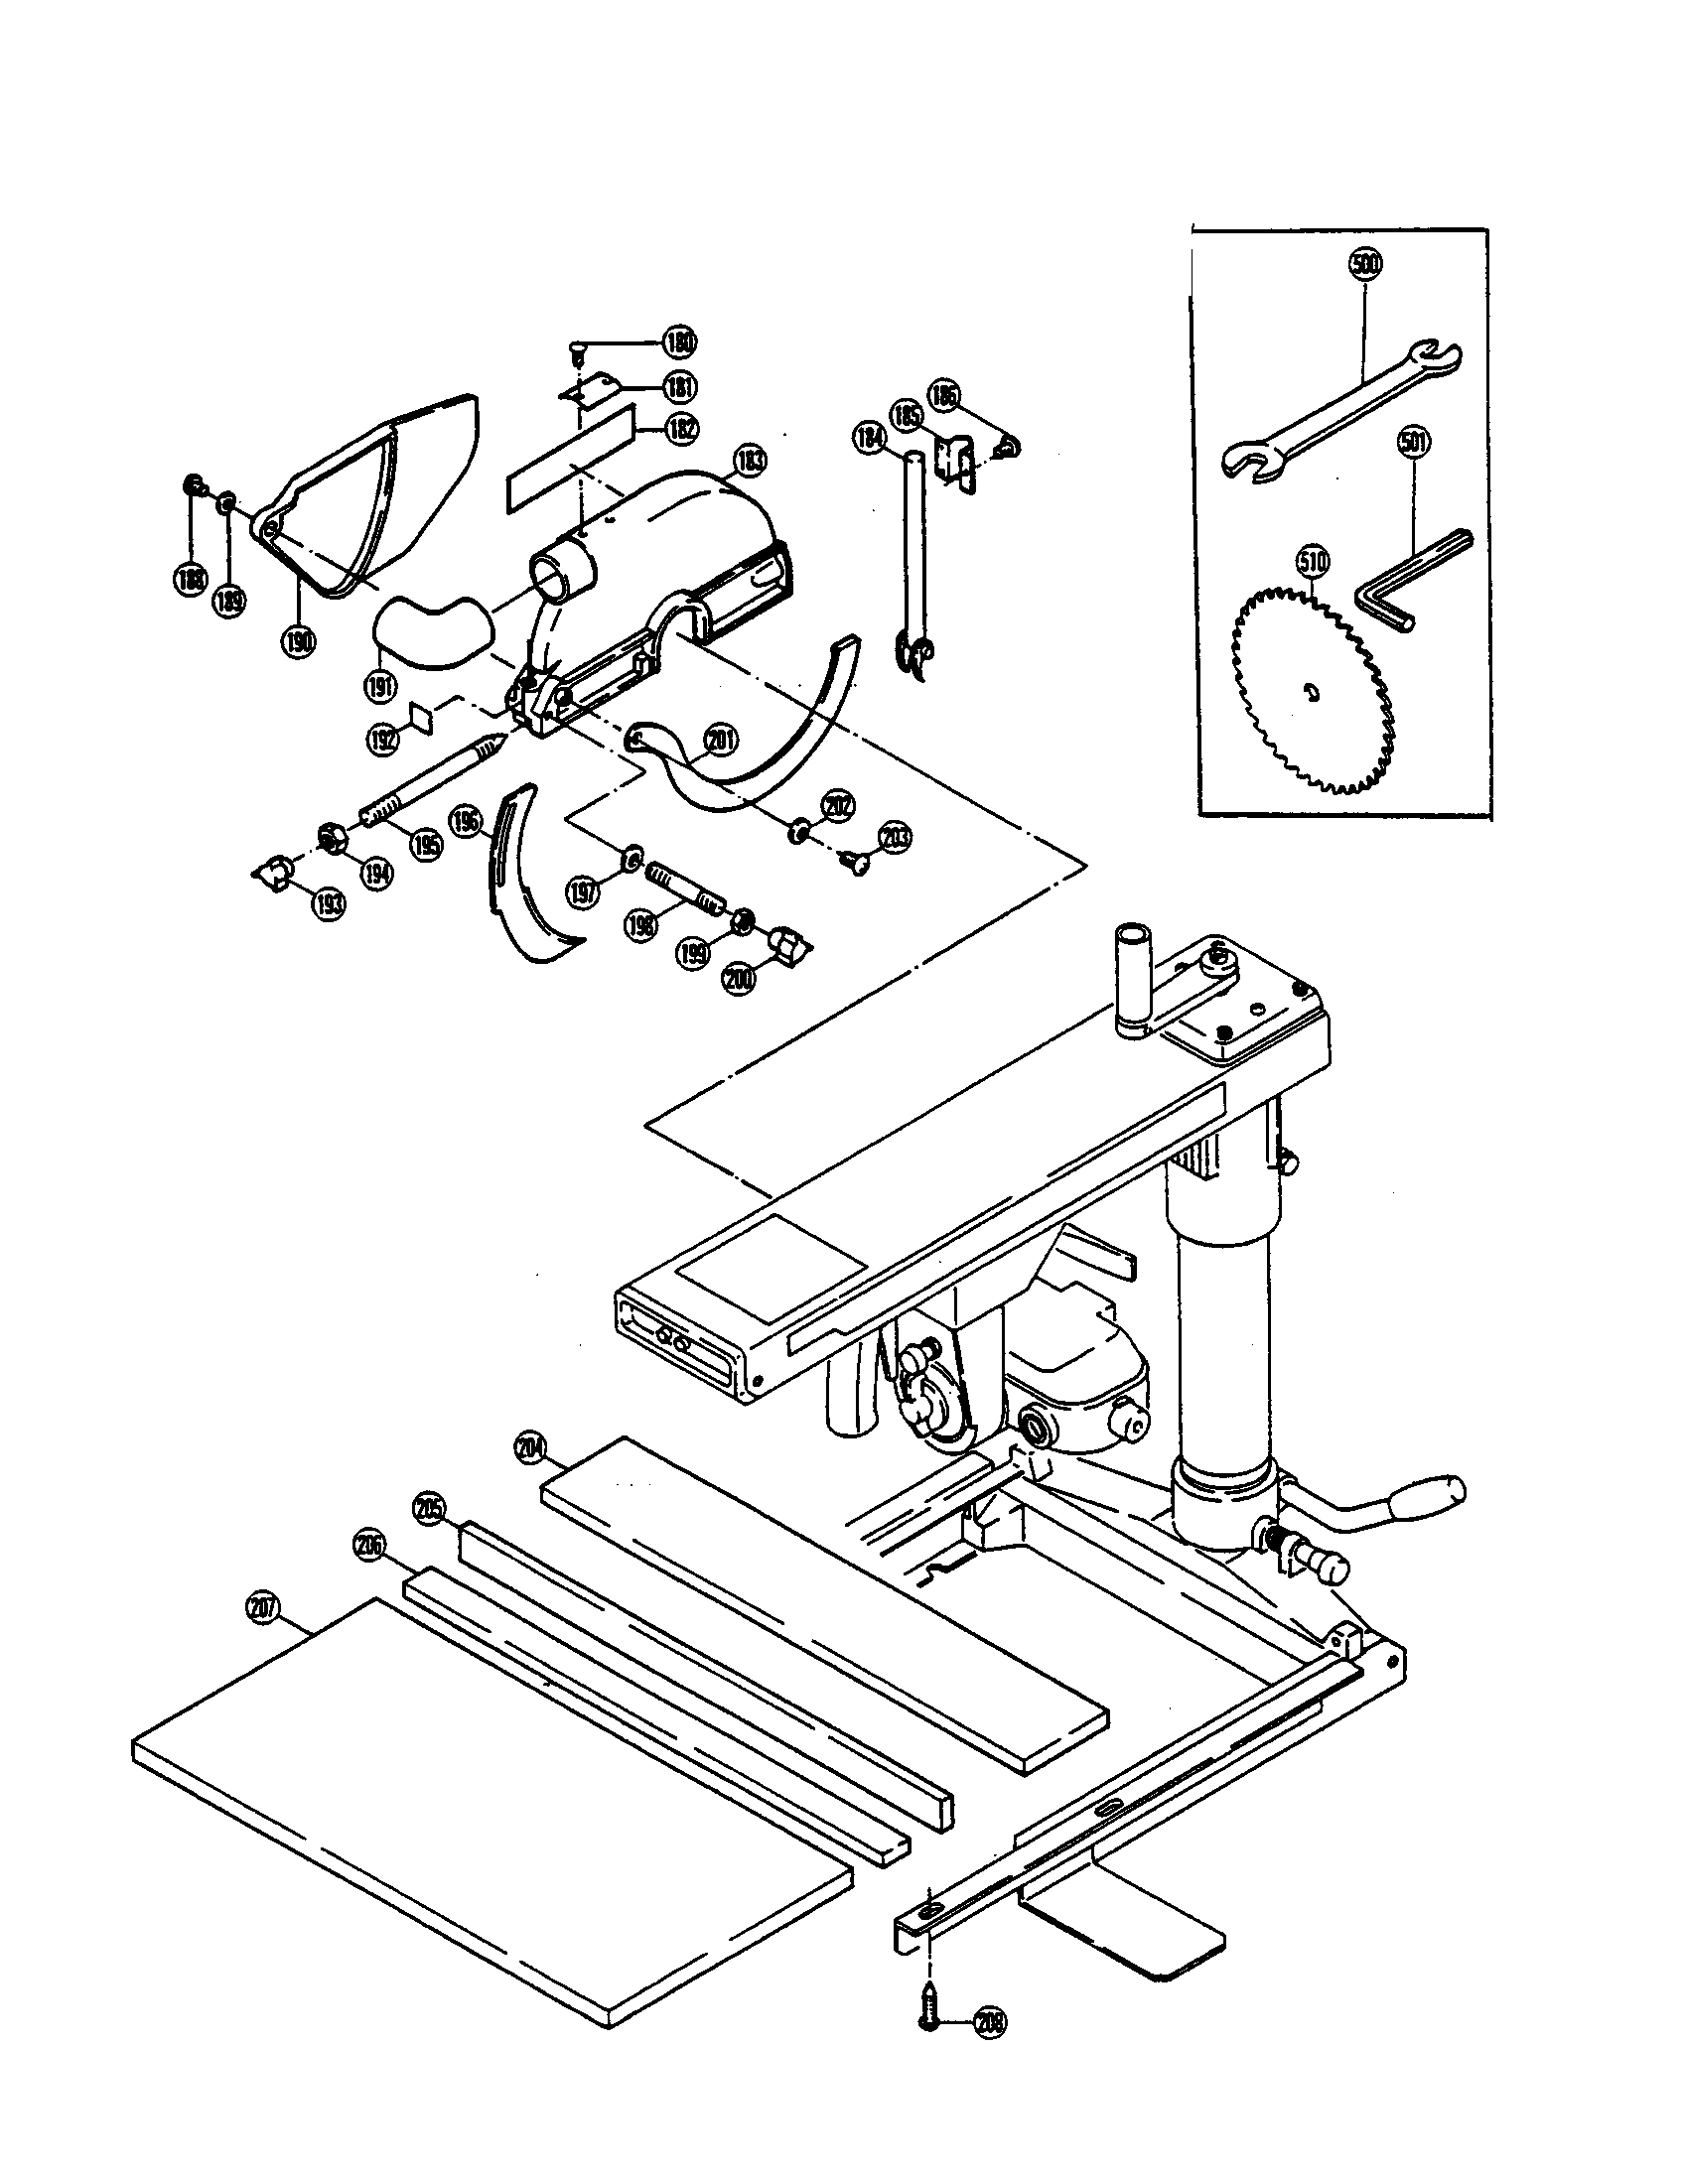 Ryobi model RA-200 saw radial genuine parts